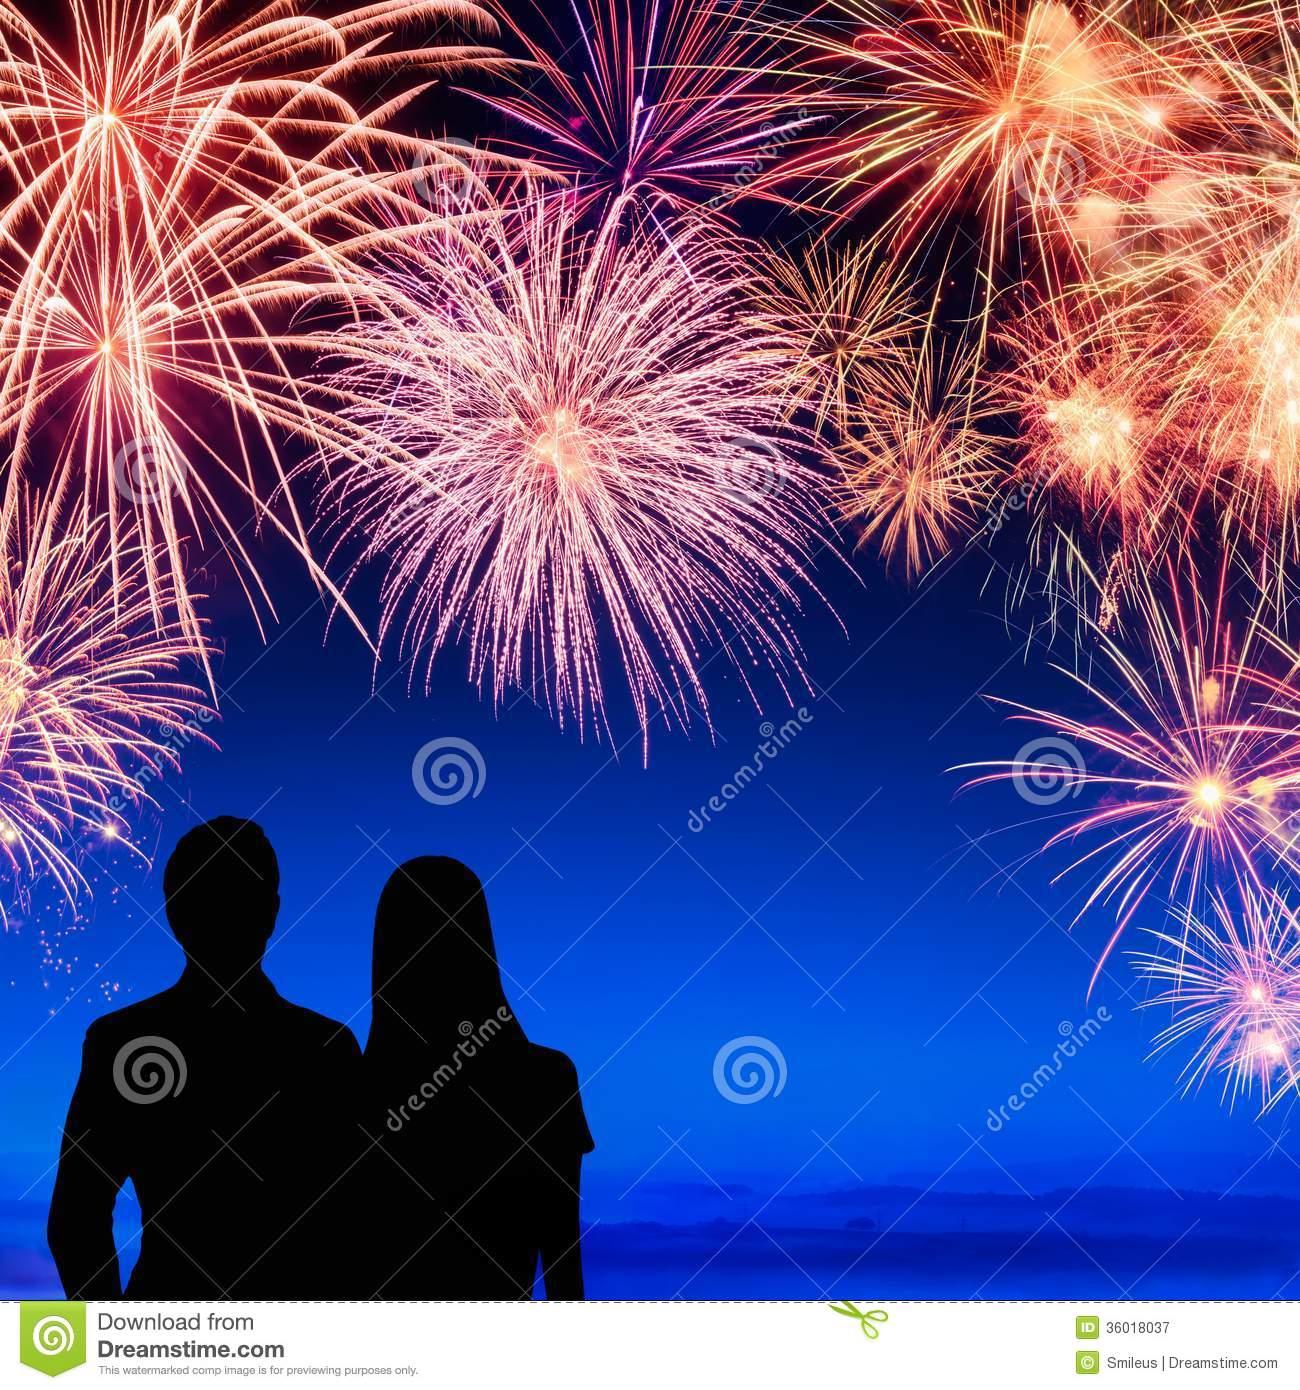 Couple Enjoying A Fireworks Display Royalty Free Stock Photography.